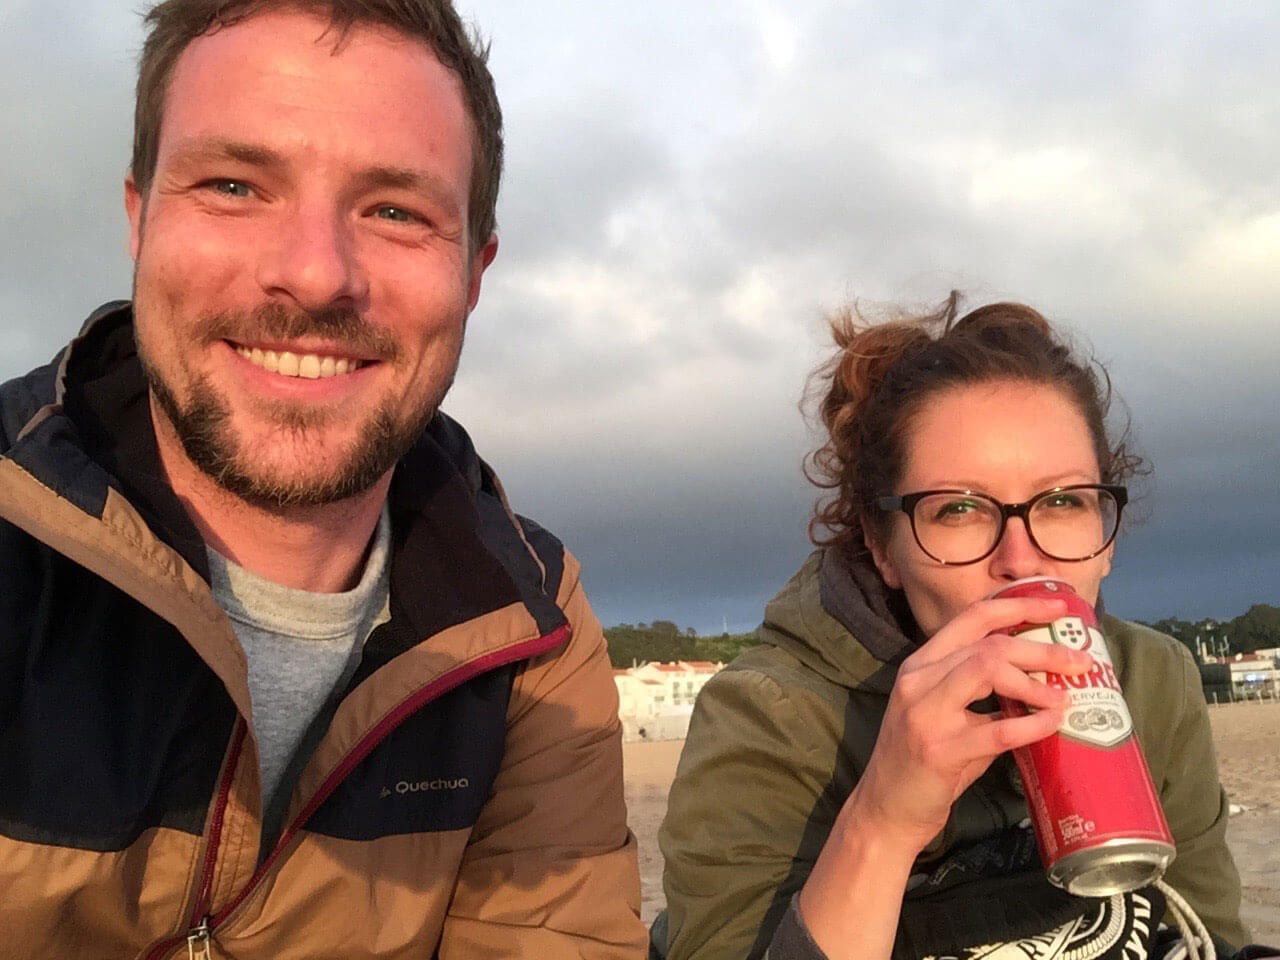 Dosenbiermomente am Strand von Nazare Portugal